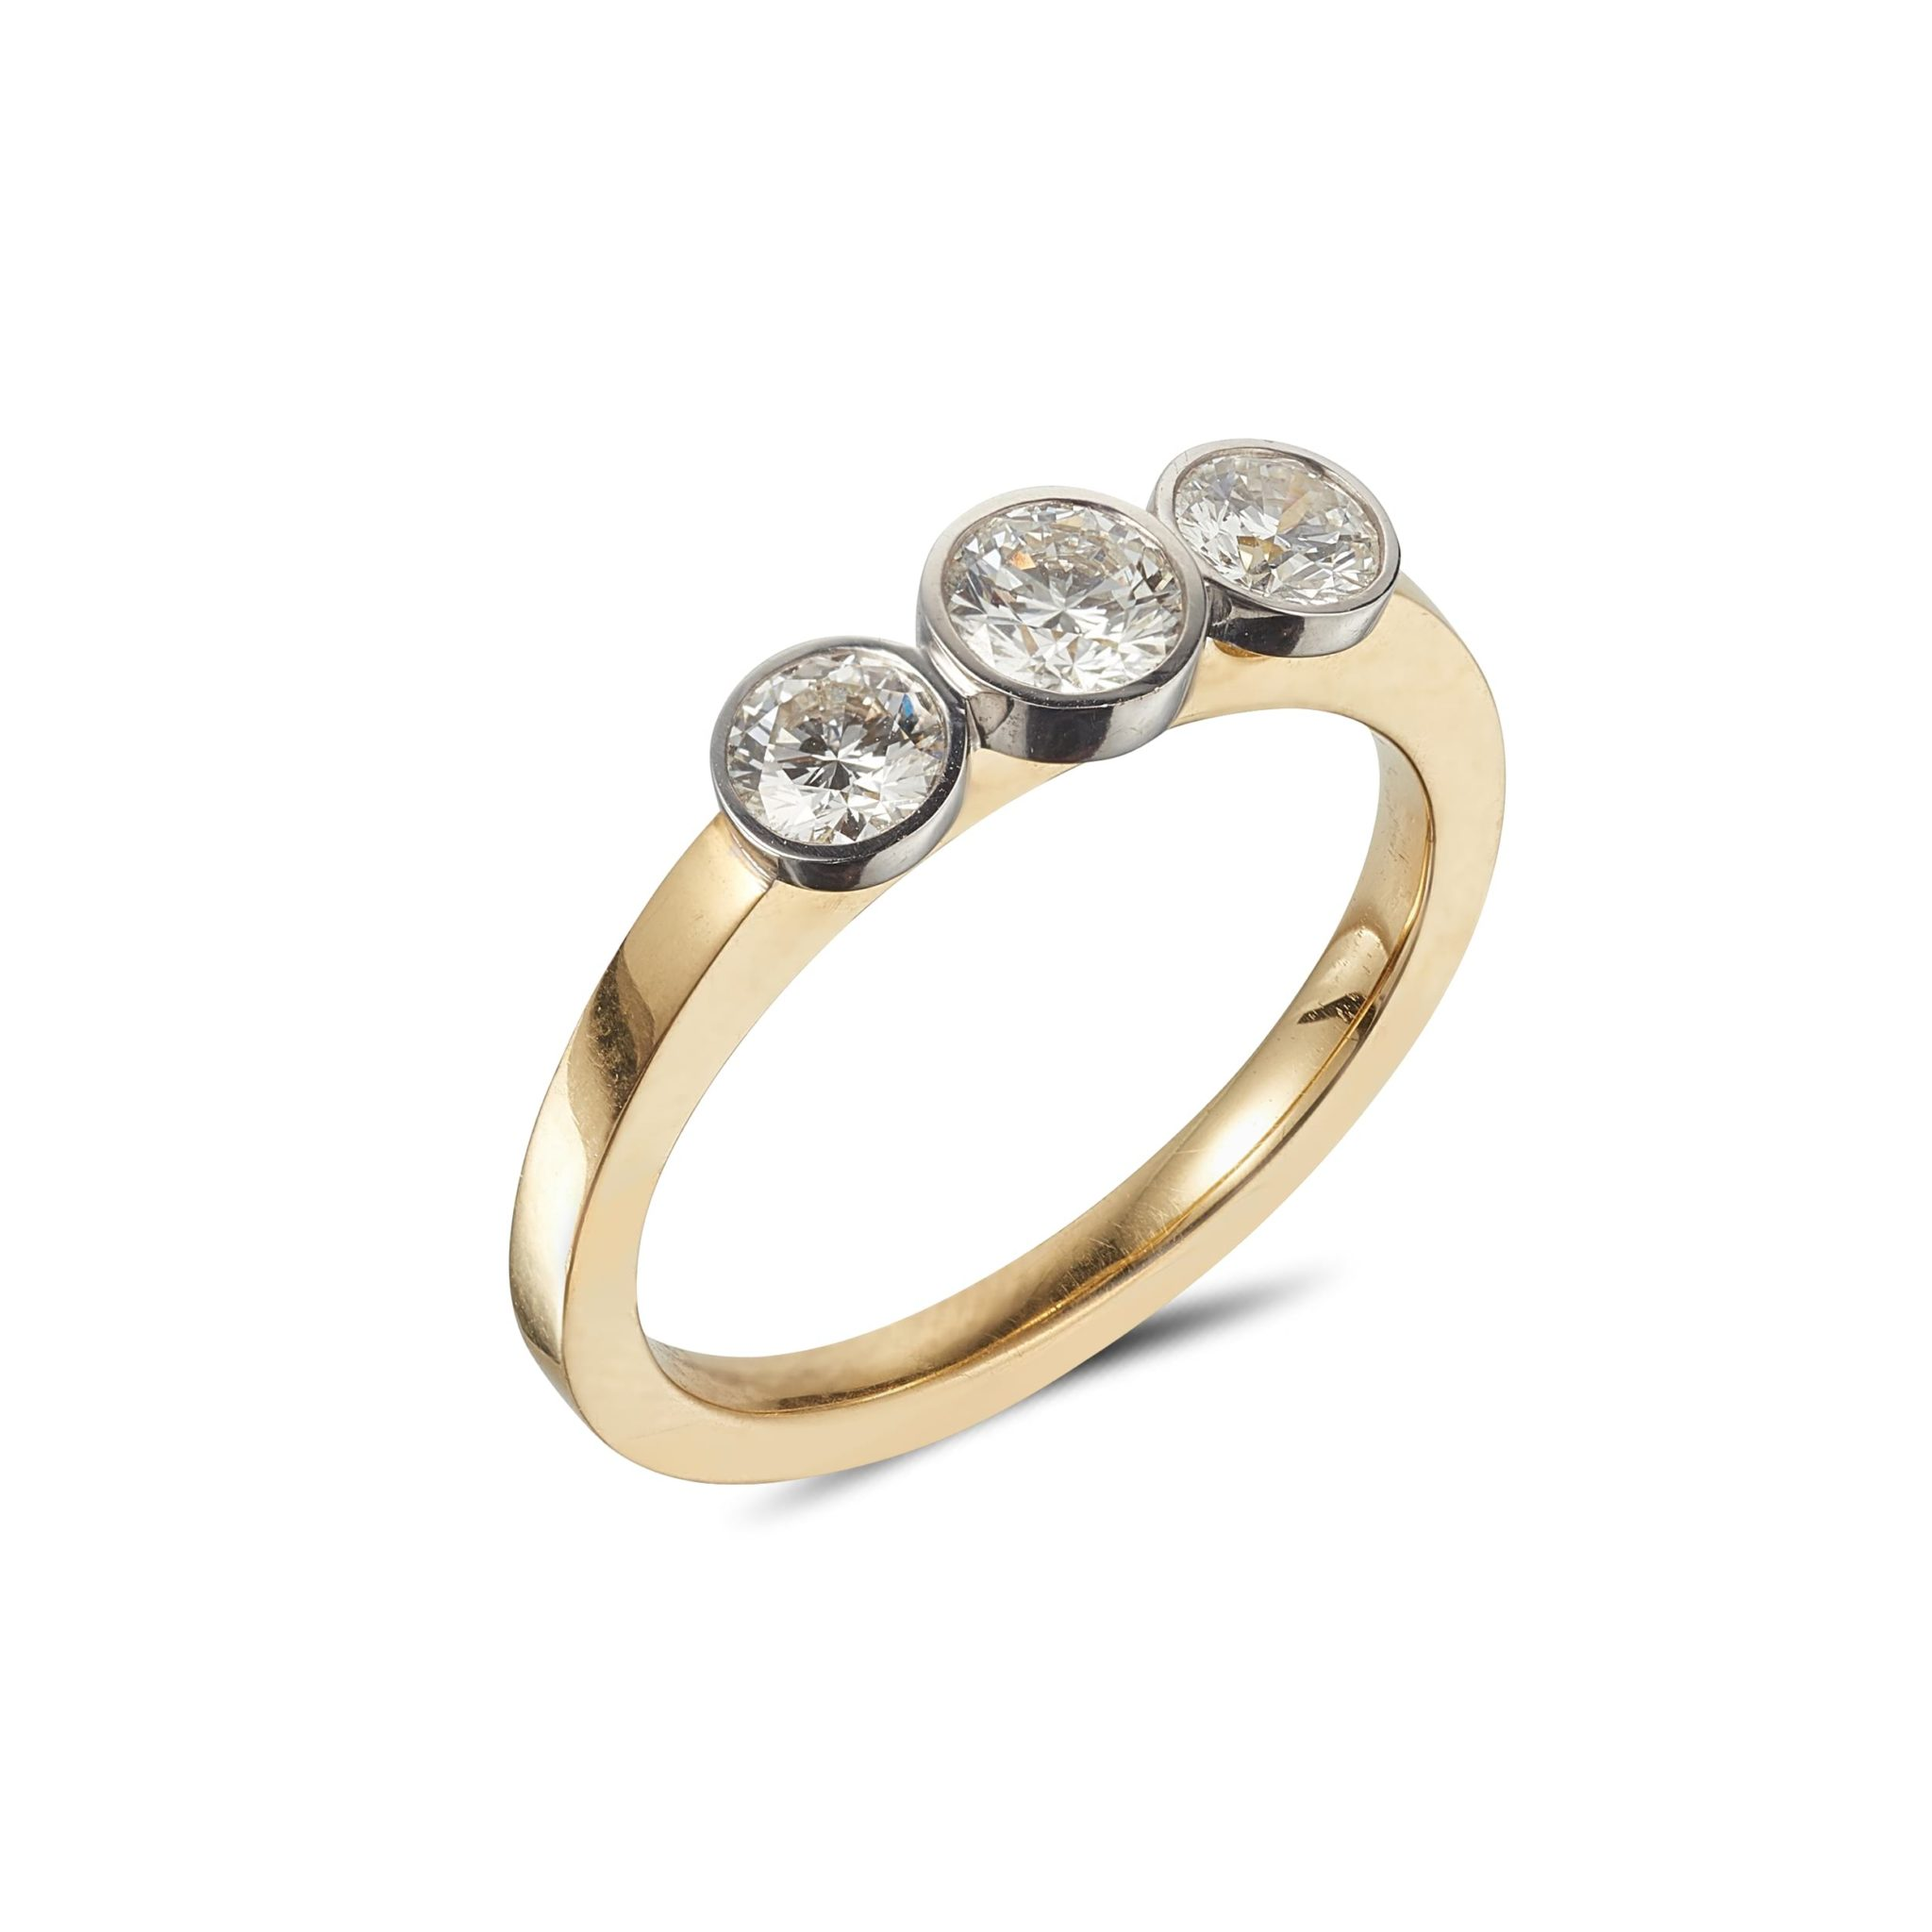 GOLD RING WITH THREE WHITE GOLD BEZEL SET DIAMONDS